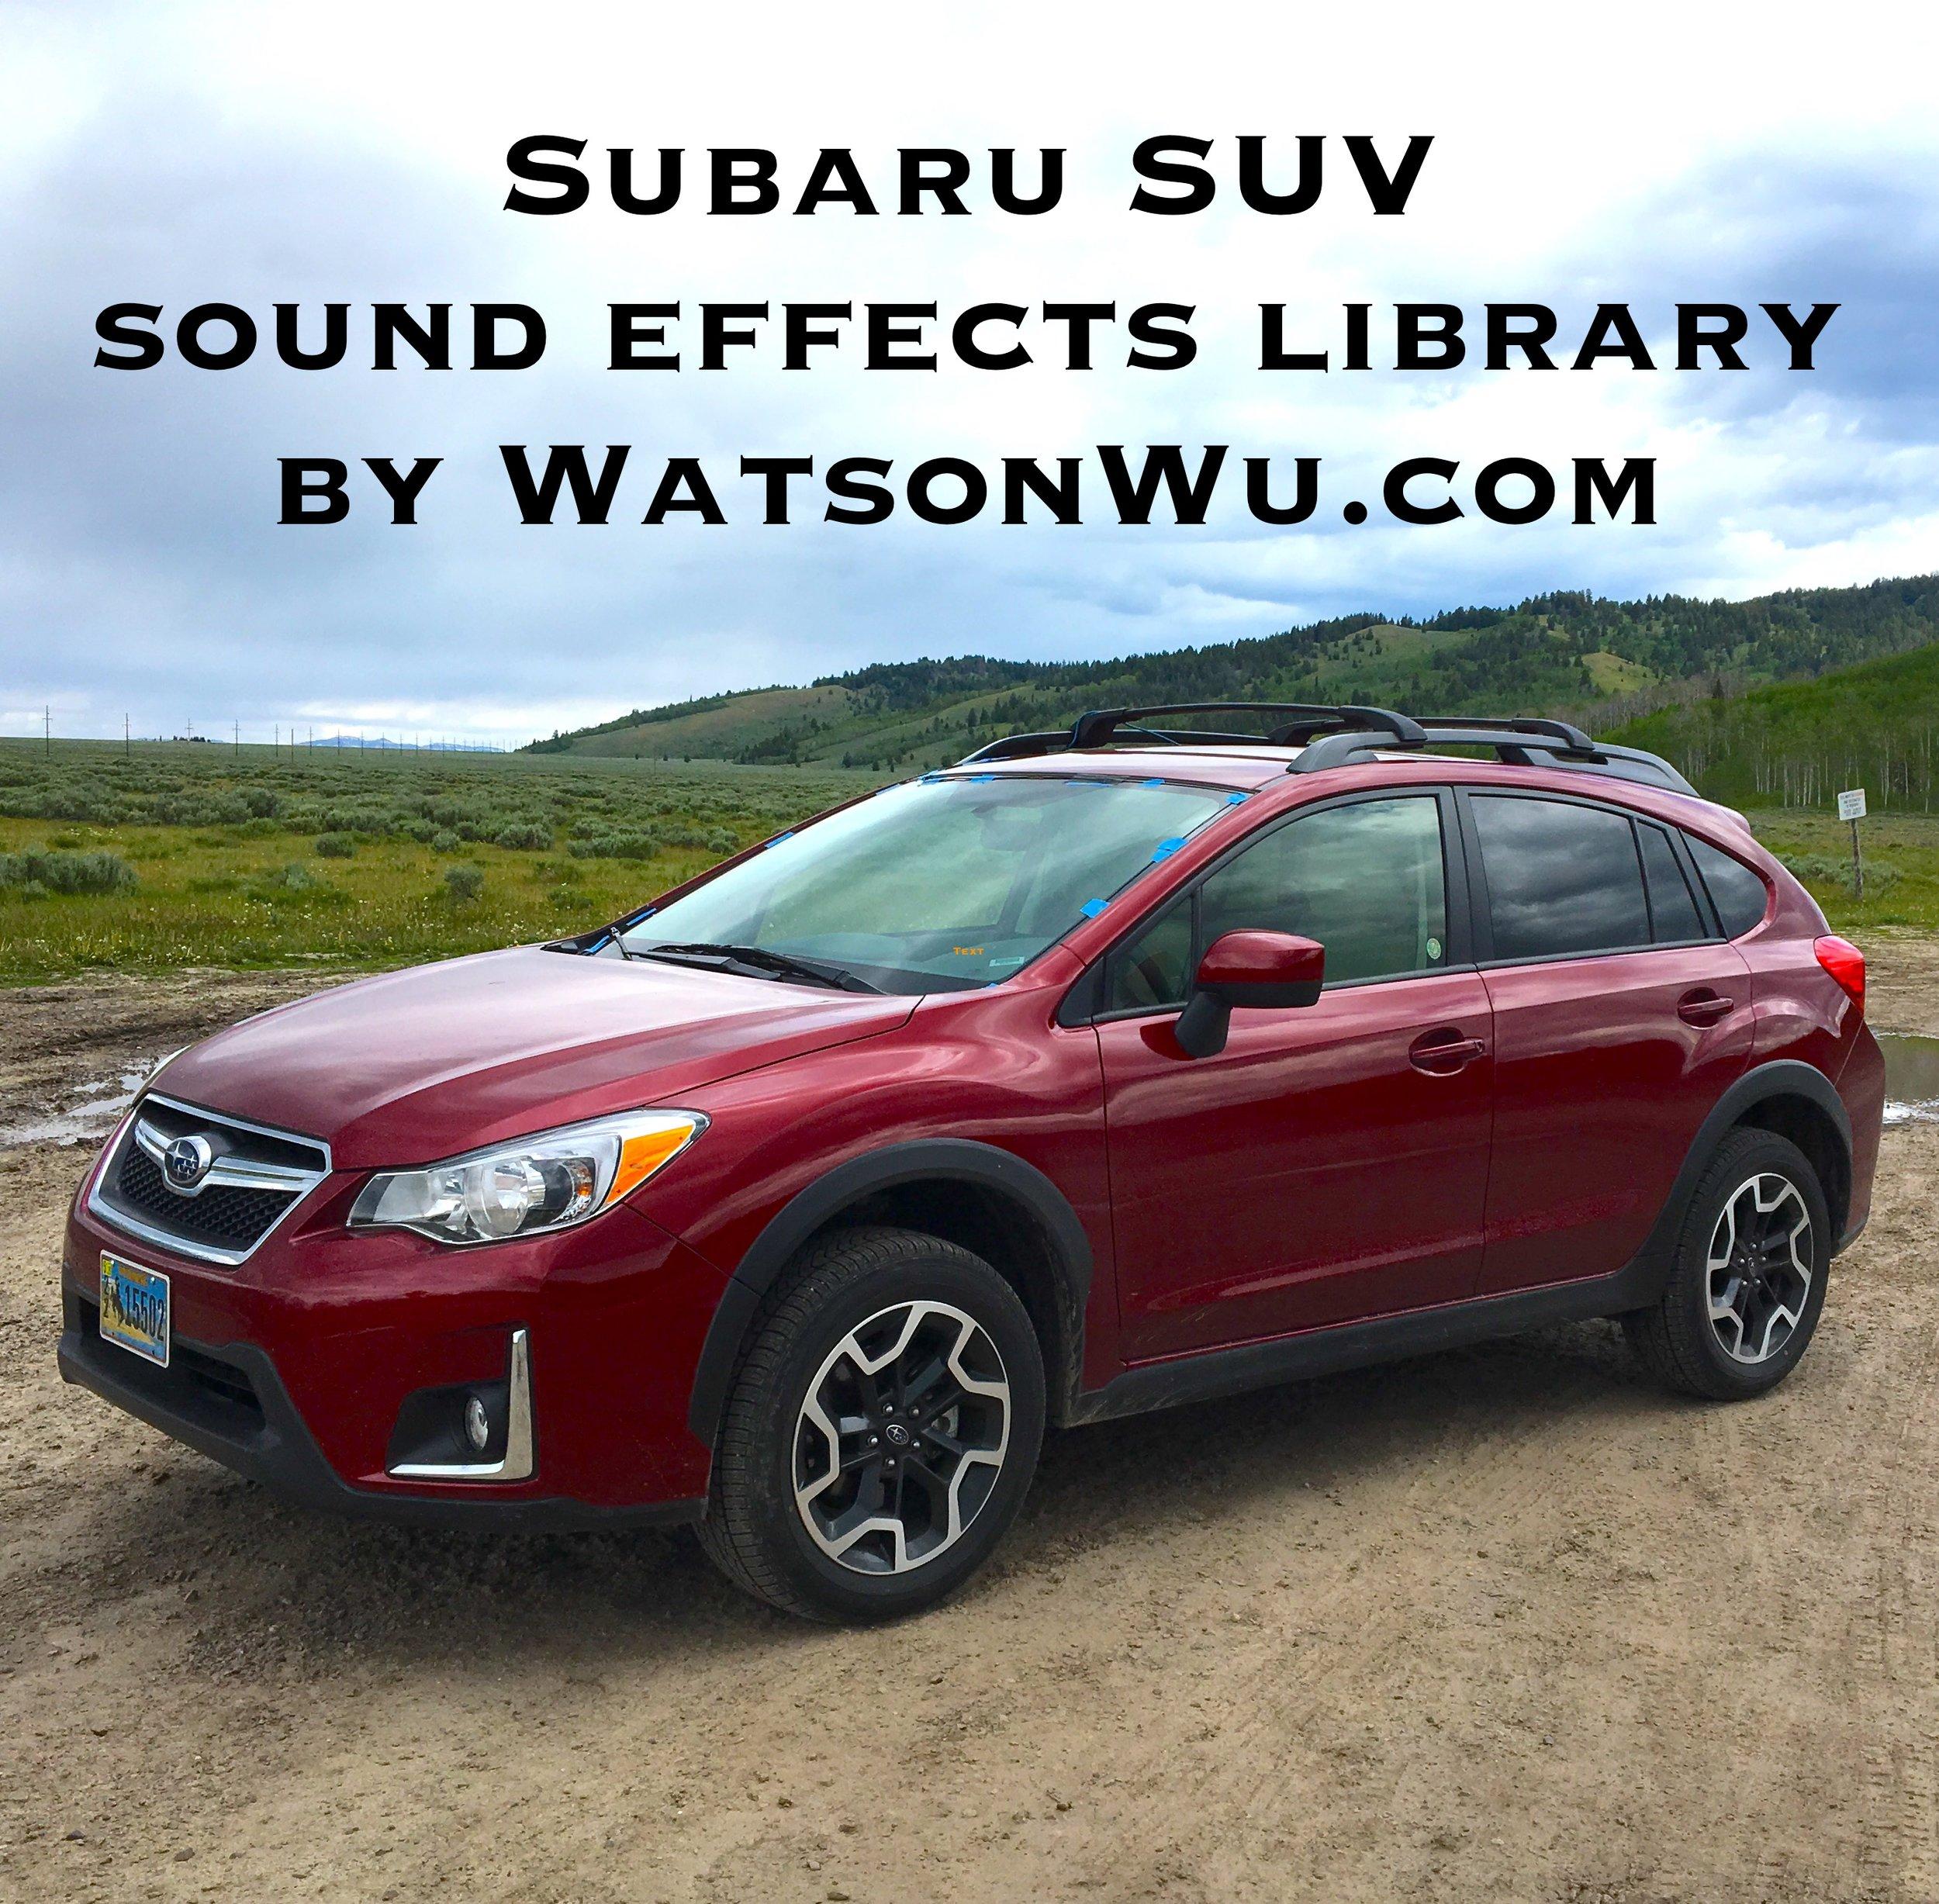 Subaru Crosstrek 2017 SUV sfx library by WatsonWu.com.JPG